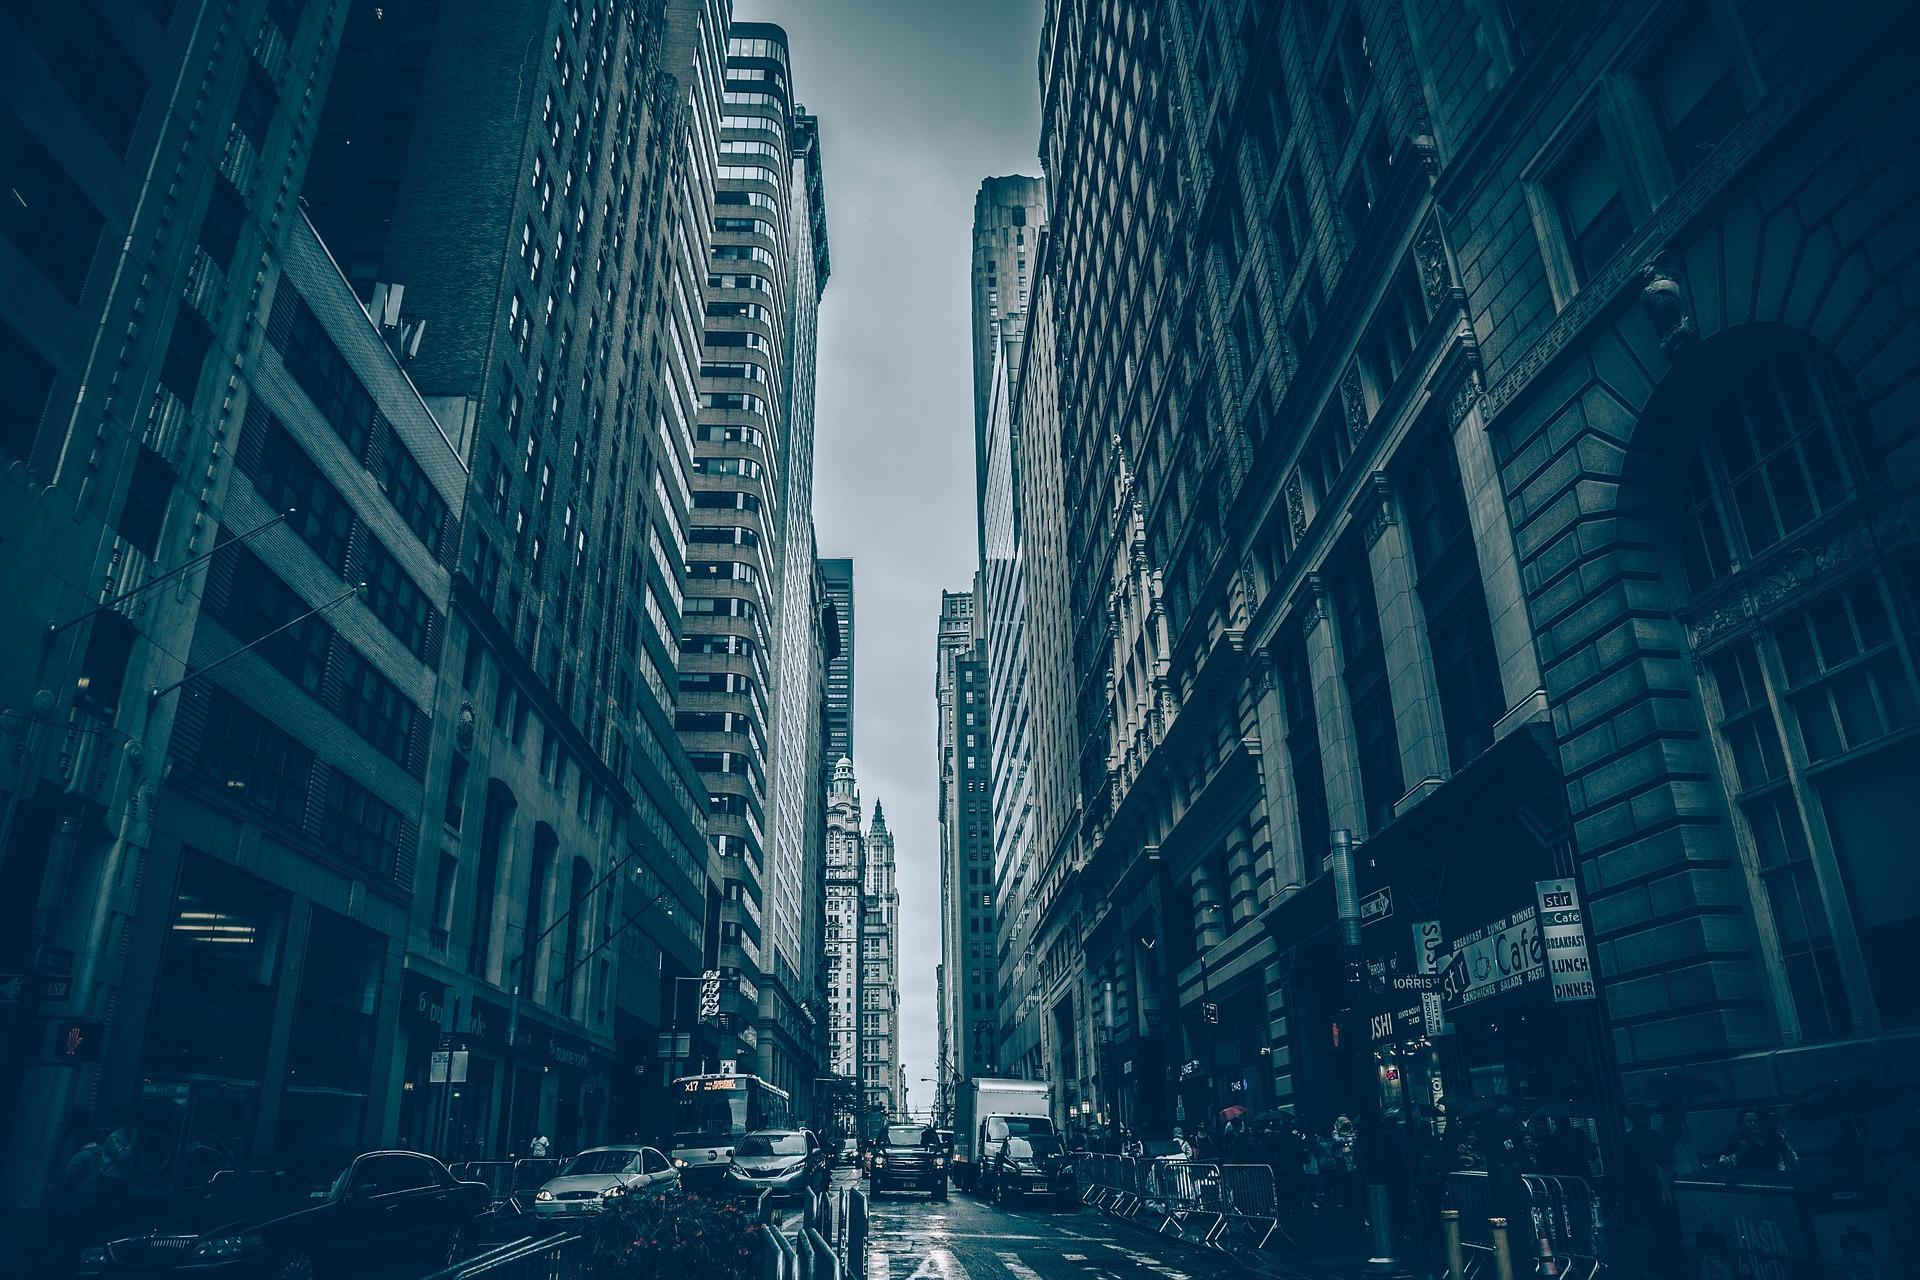 city-731296_1920